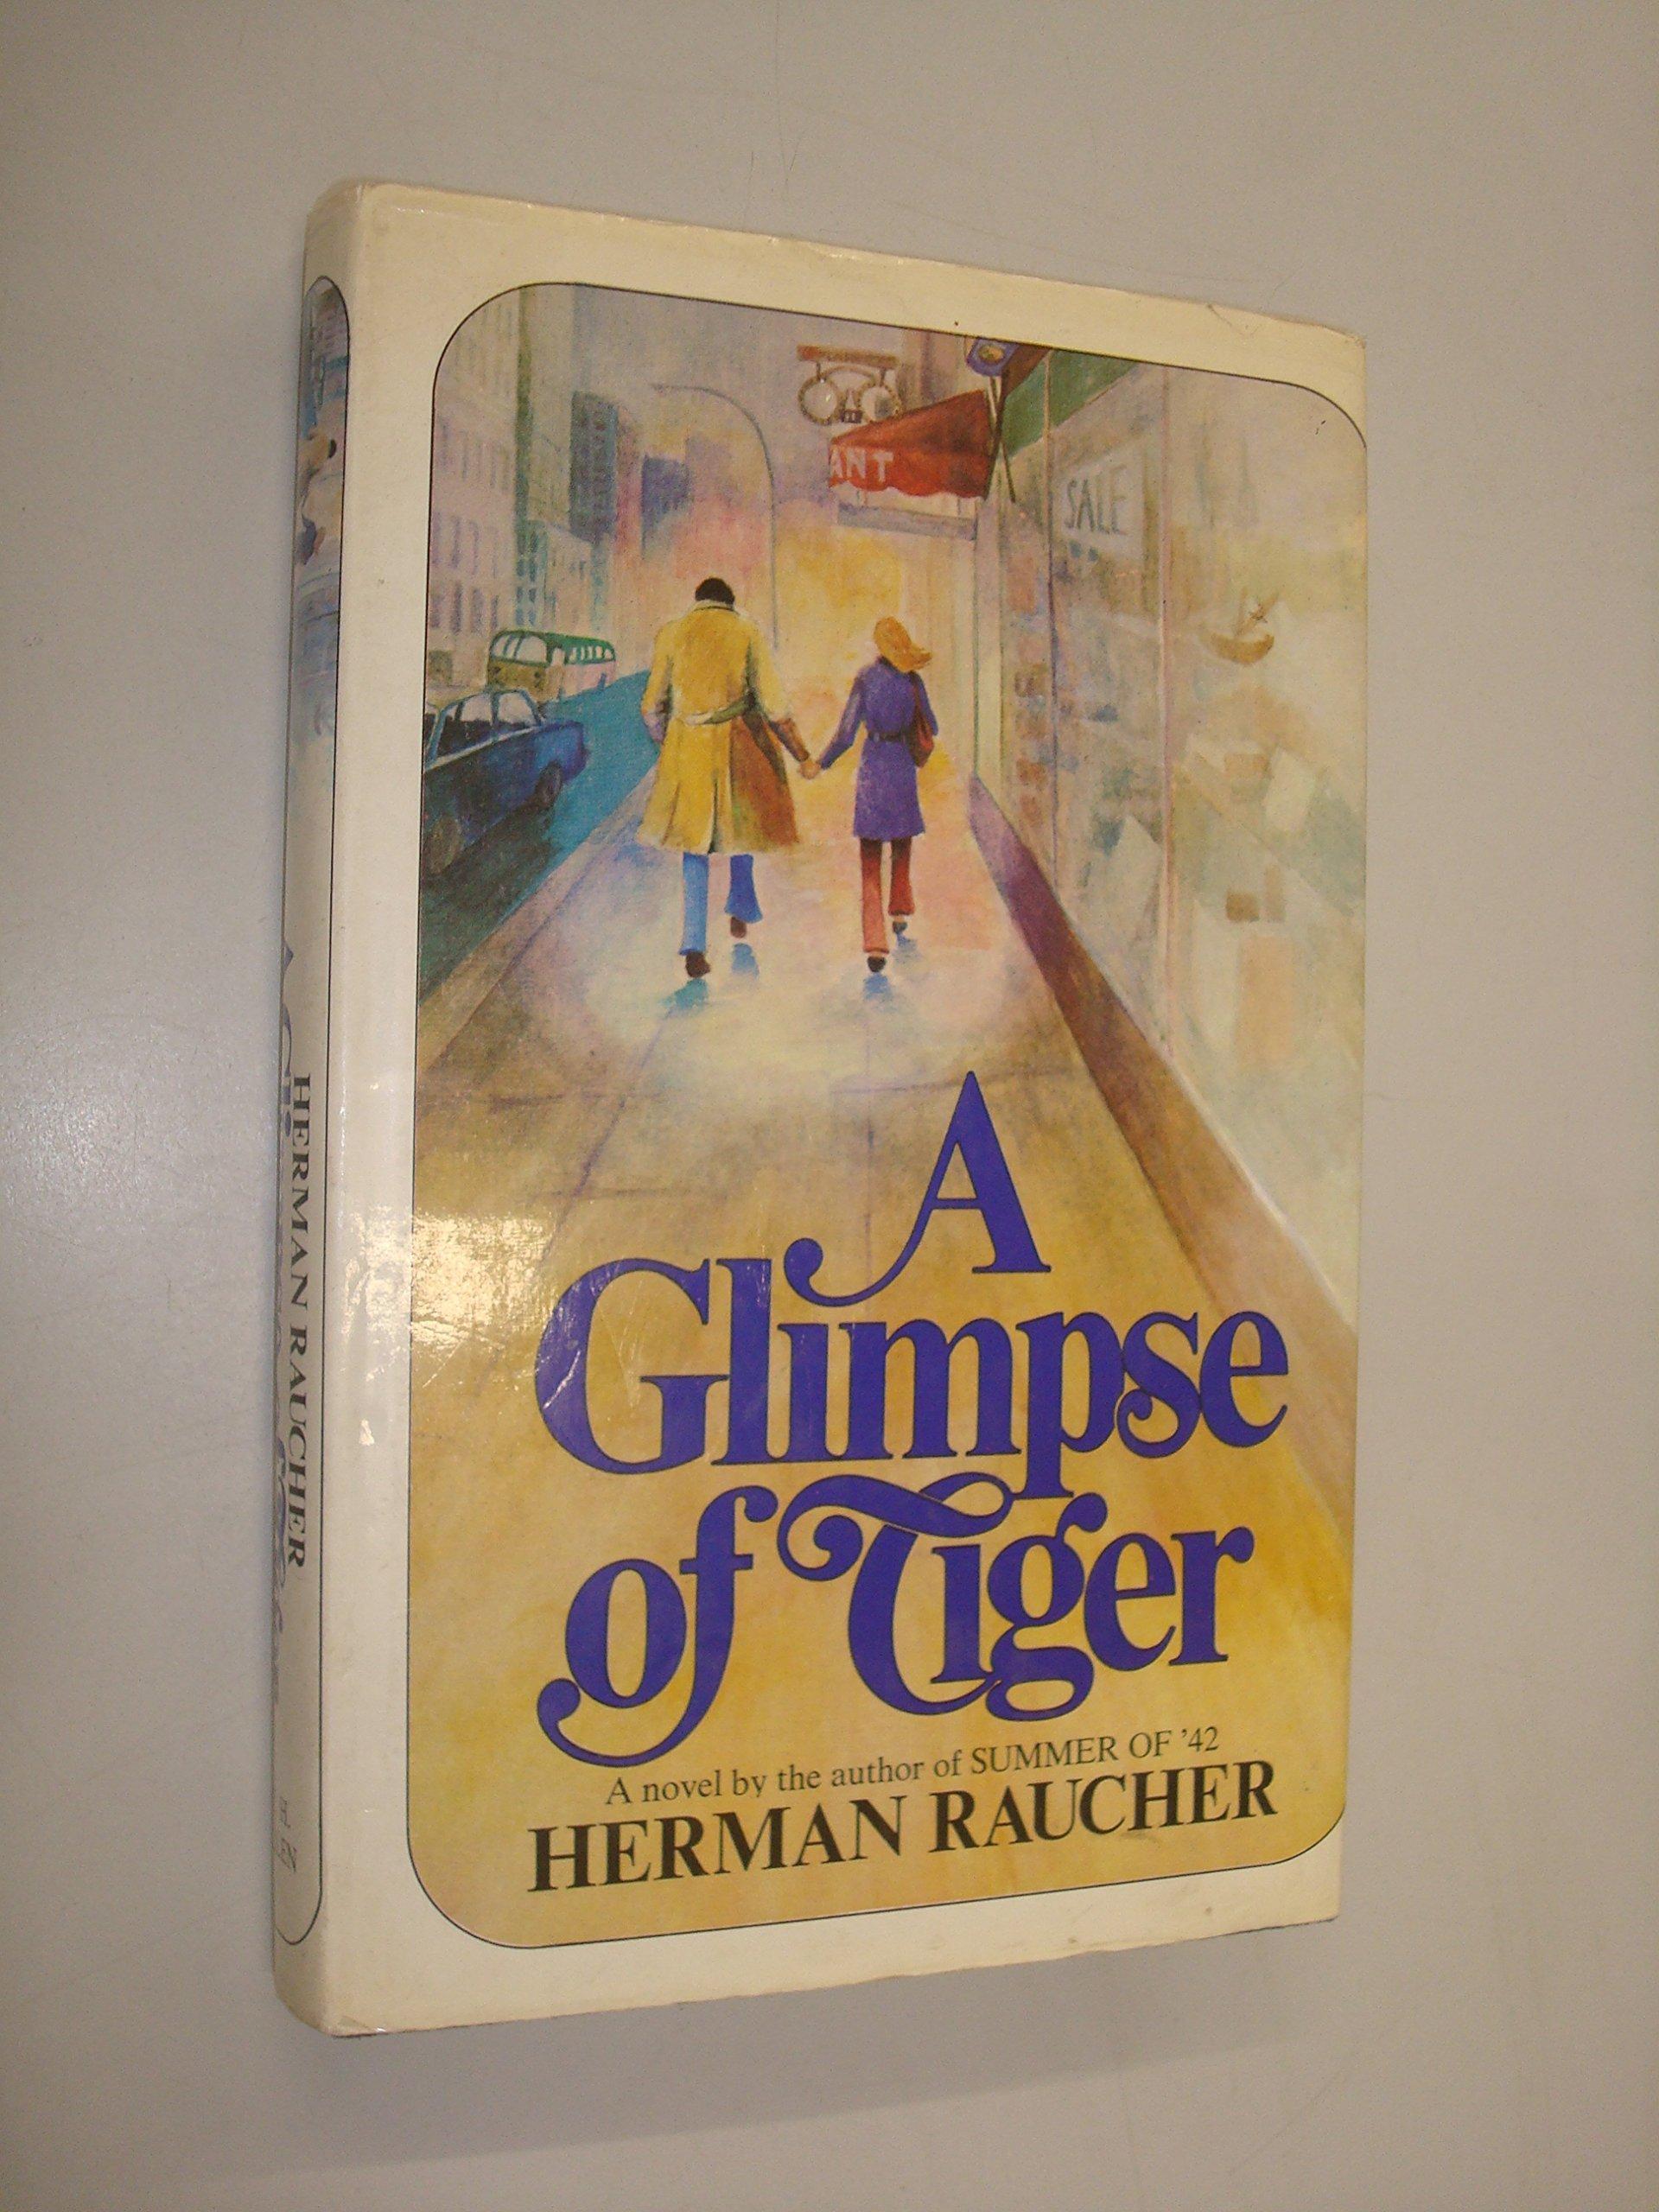 Glimpse of Tiger: Amazon.es: Herman Raucher: Libros en idiomas extranjeros